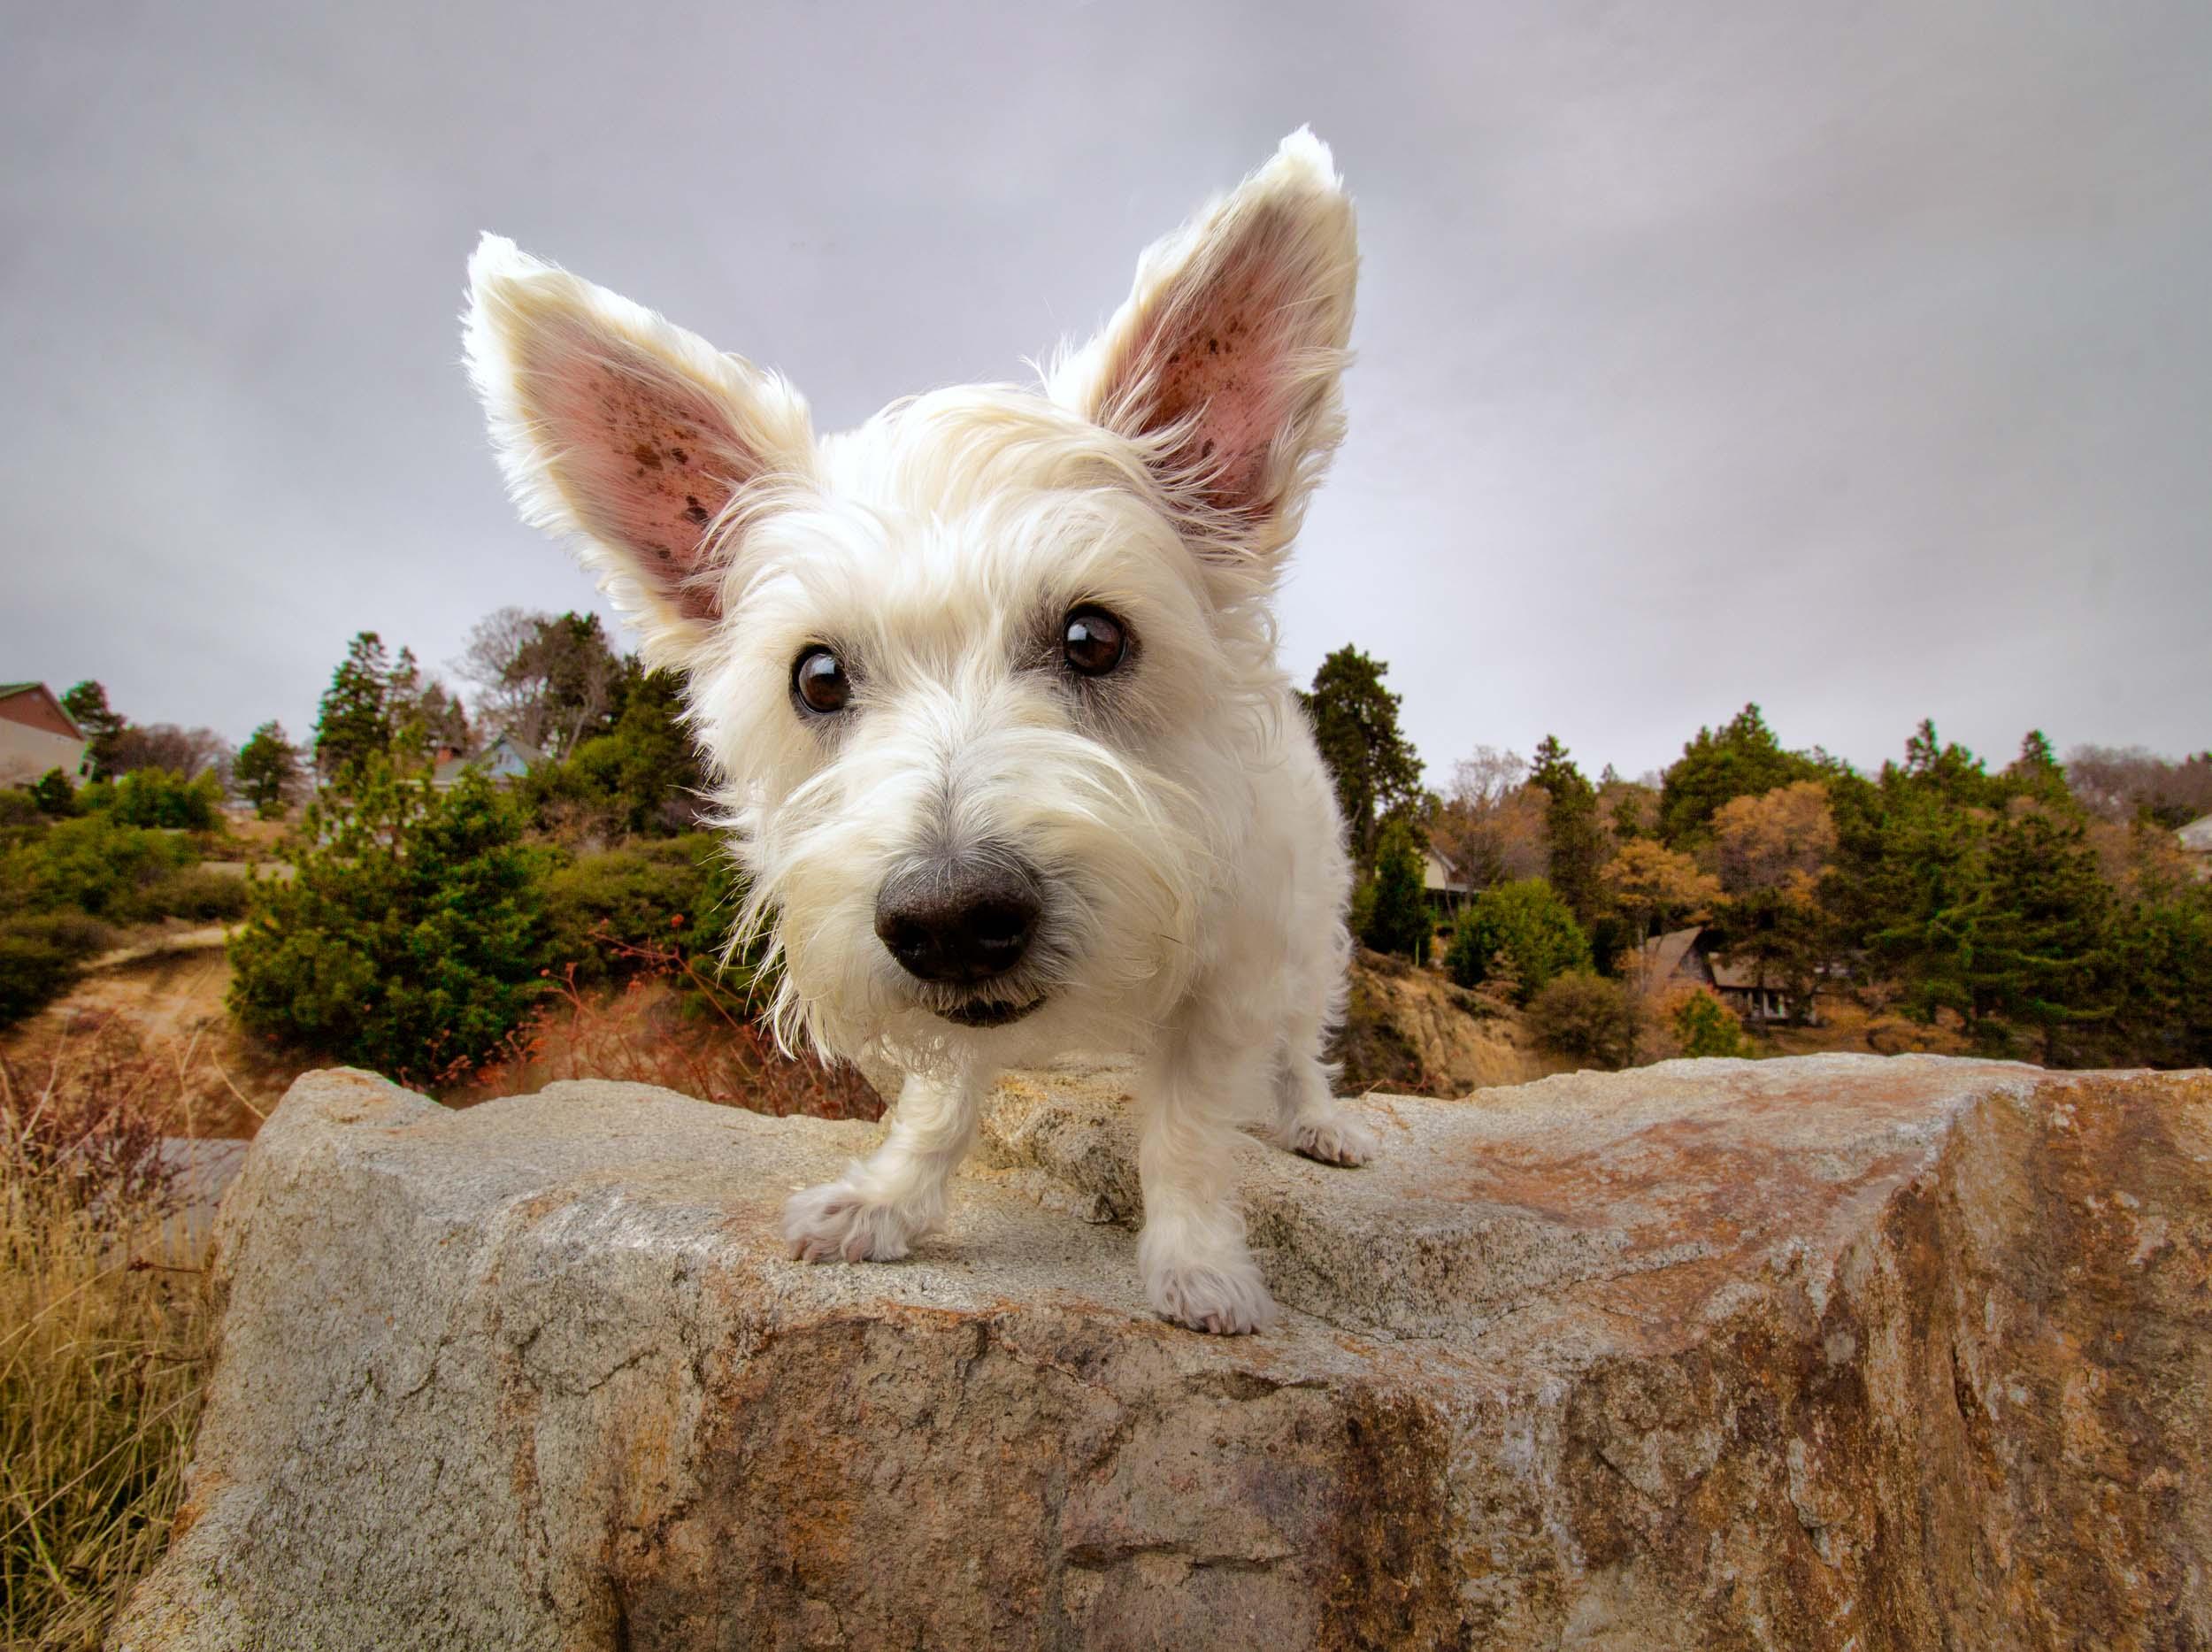 24-Orange-County-Dog-Photographer-Southern-California-Steamer-Lee.JPG